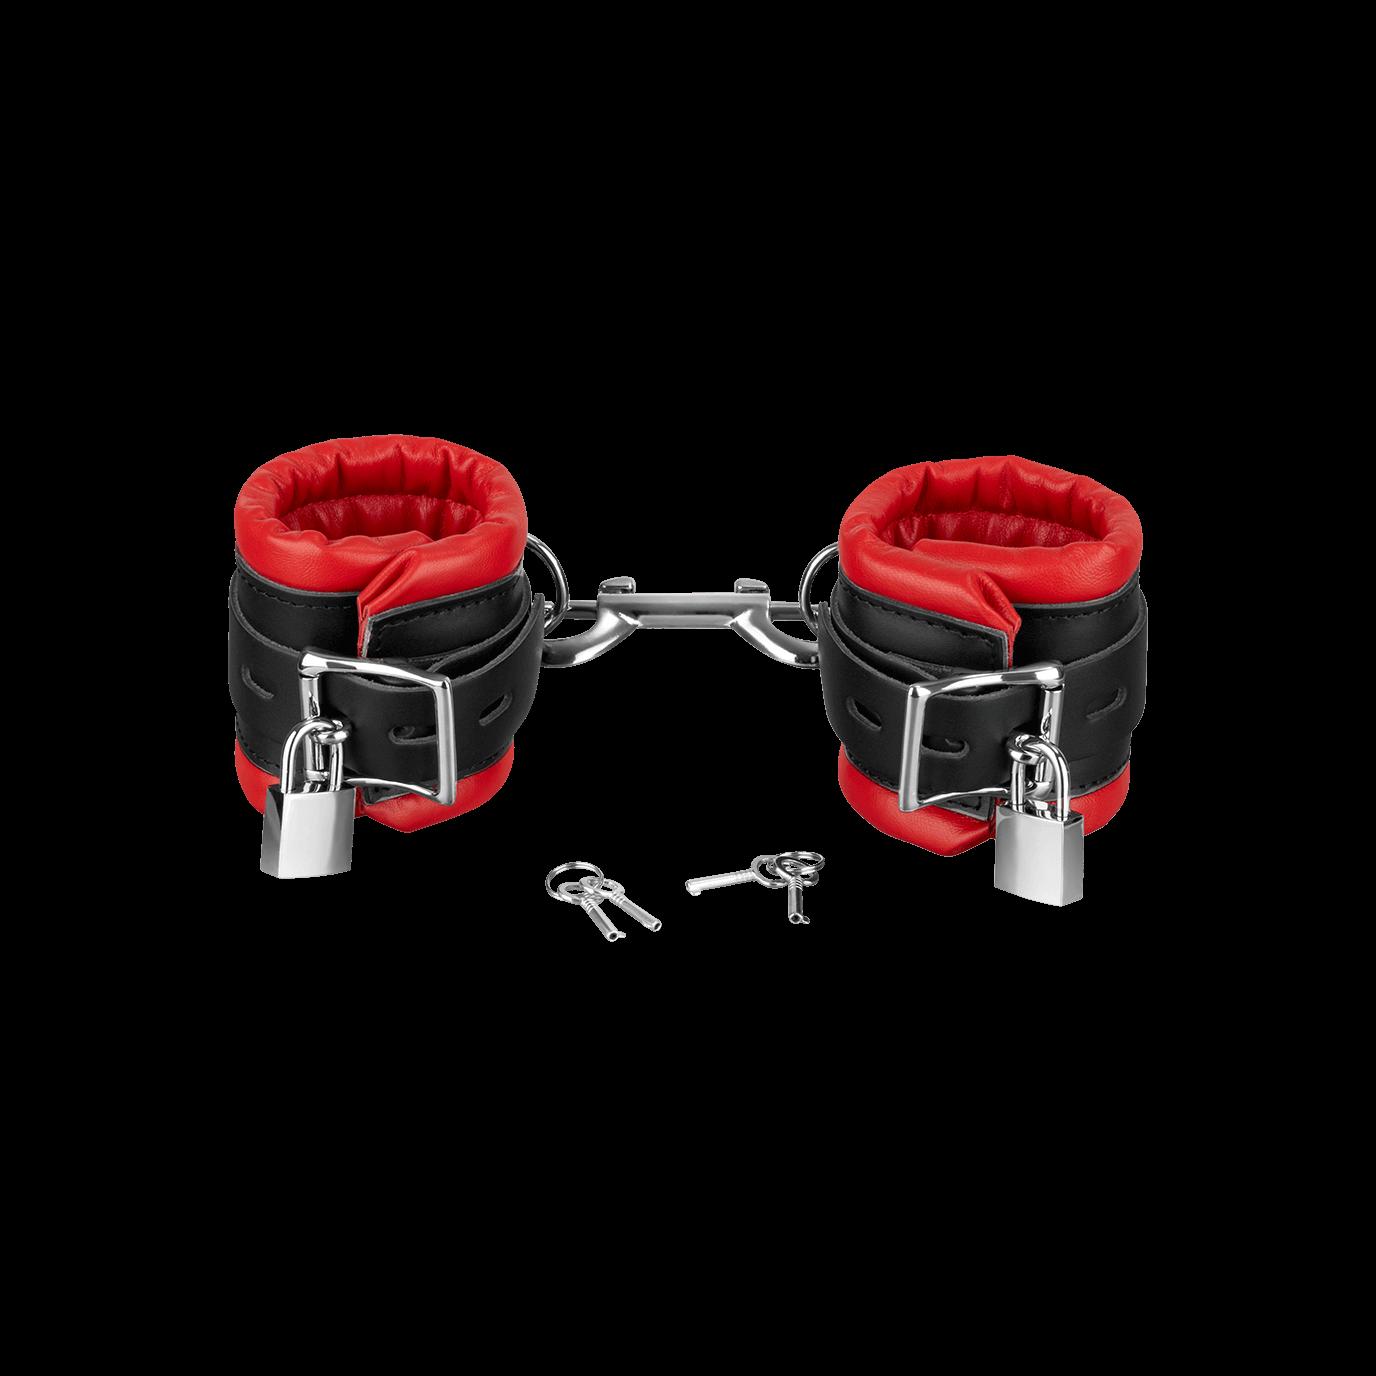 Rimba Leder-Handfesseln gepolstert und abschließbar, rot/schwarz jetztbilligerkaufen